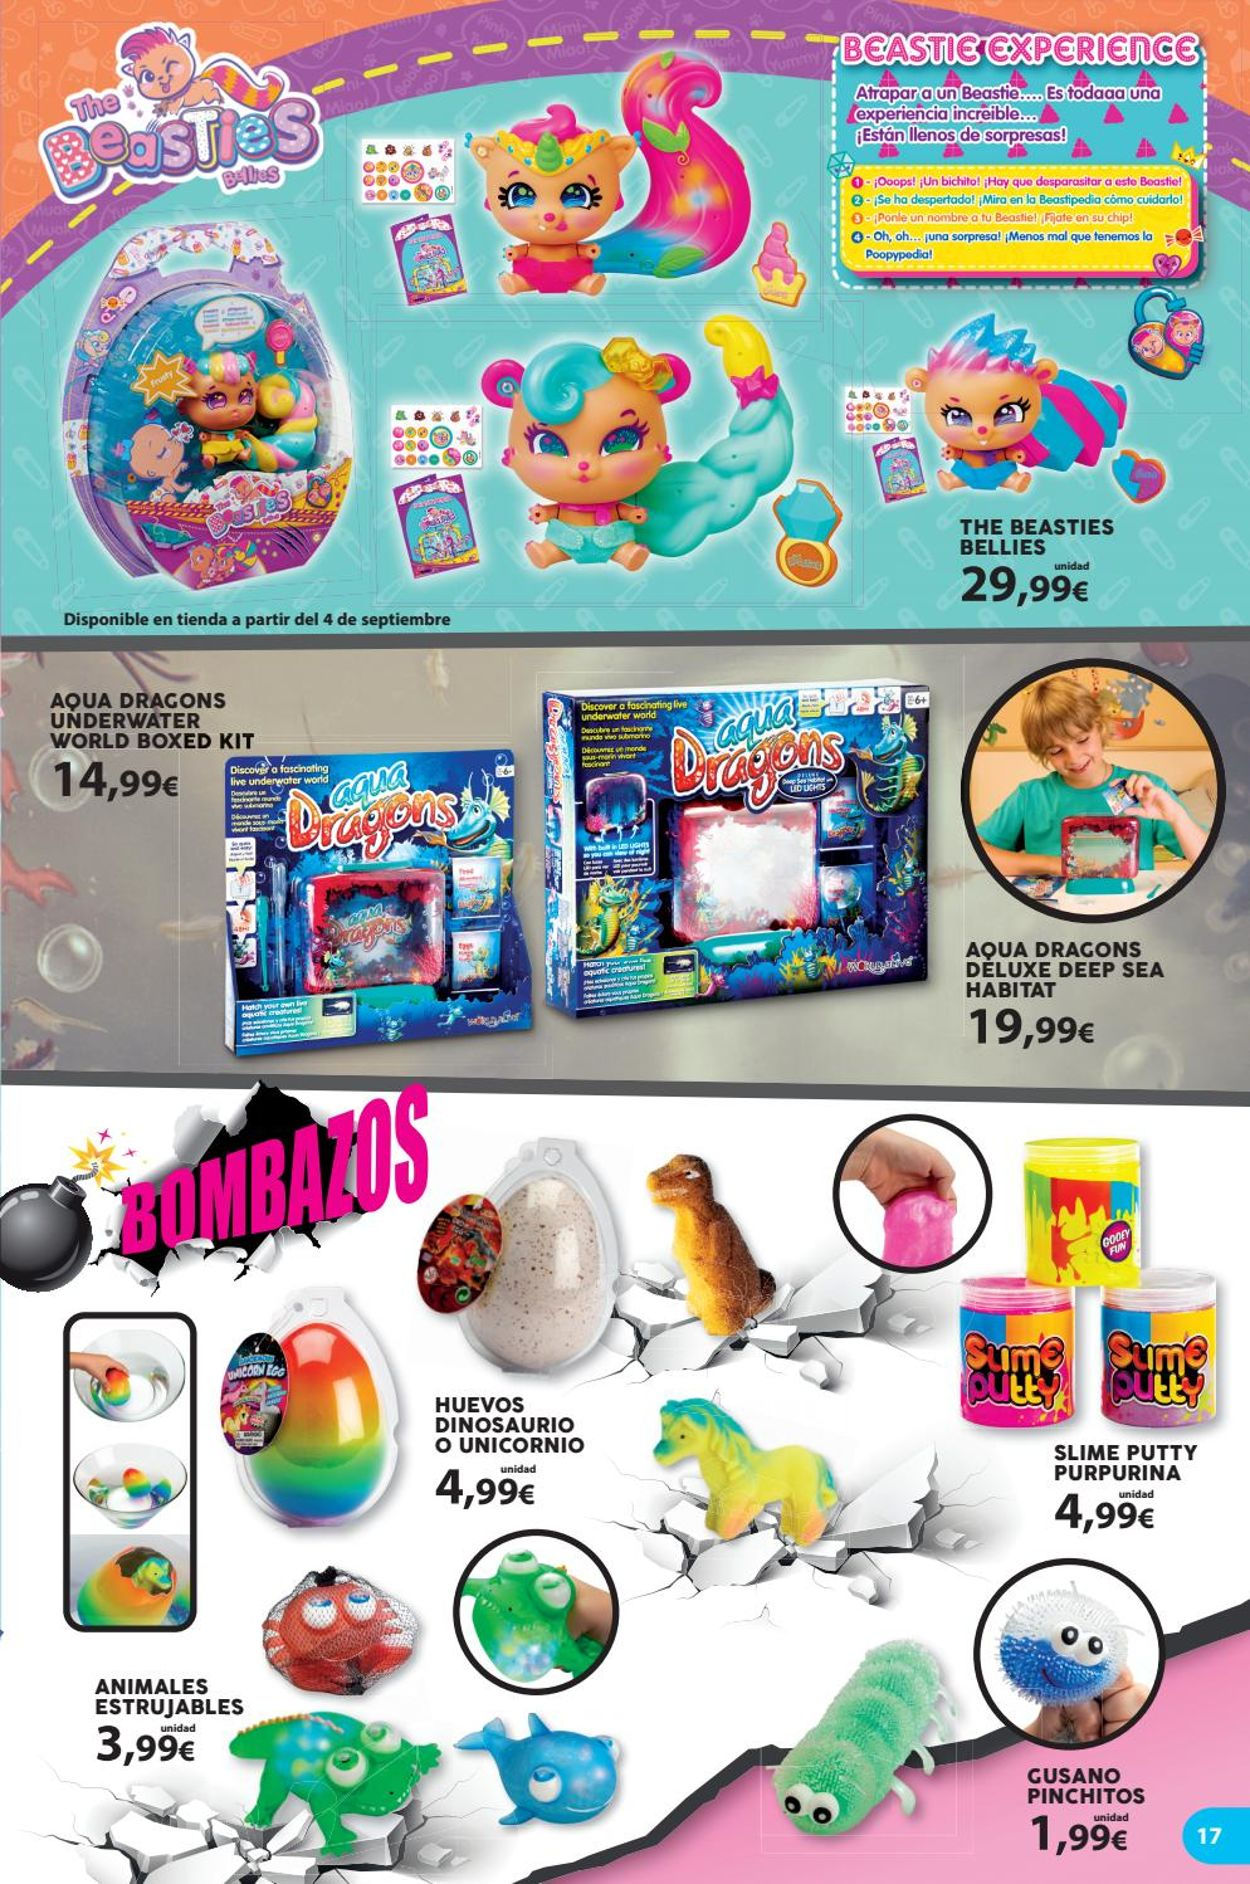 Toy Planet Folleto - 06.08-30.10.2020 (Página 17)